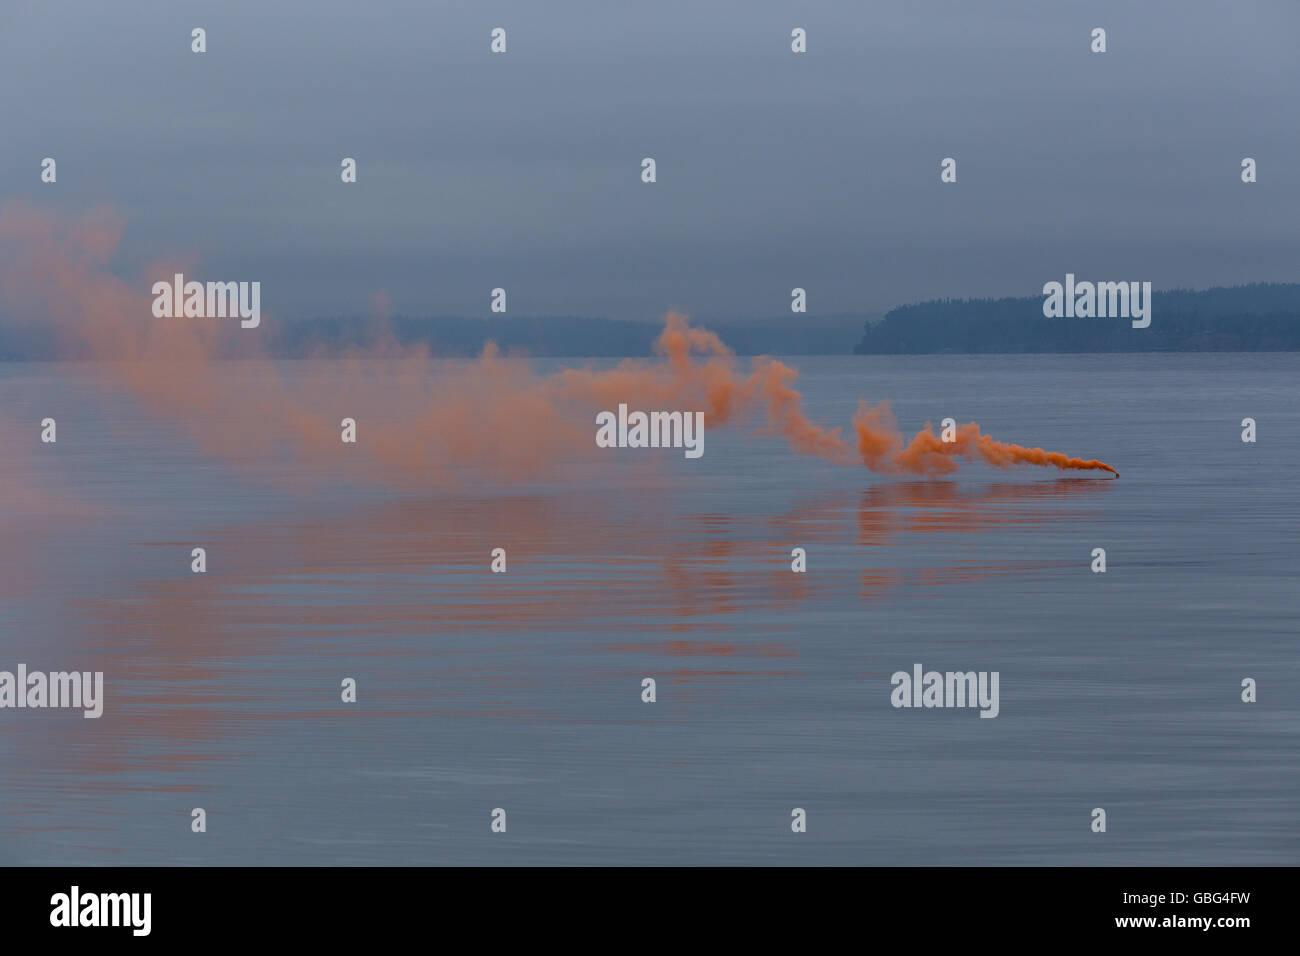 Orange smoke on the water - Stock Image